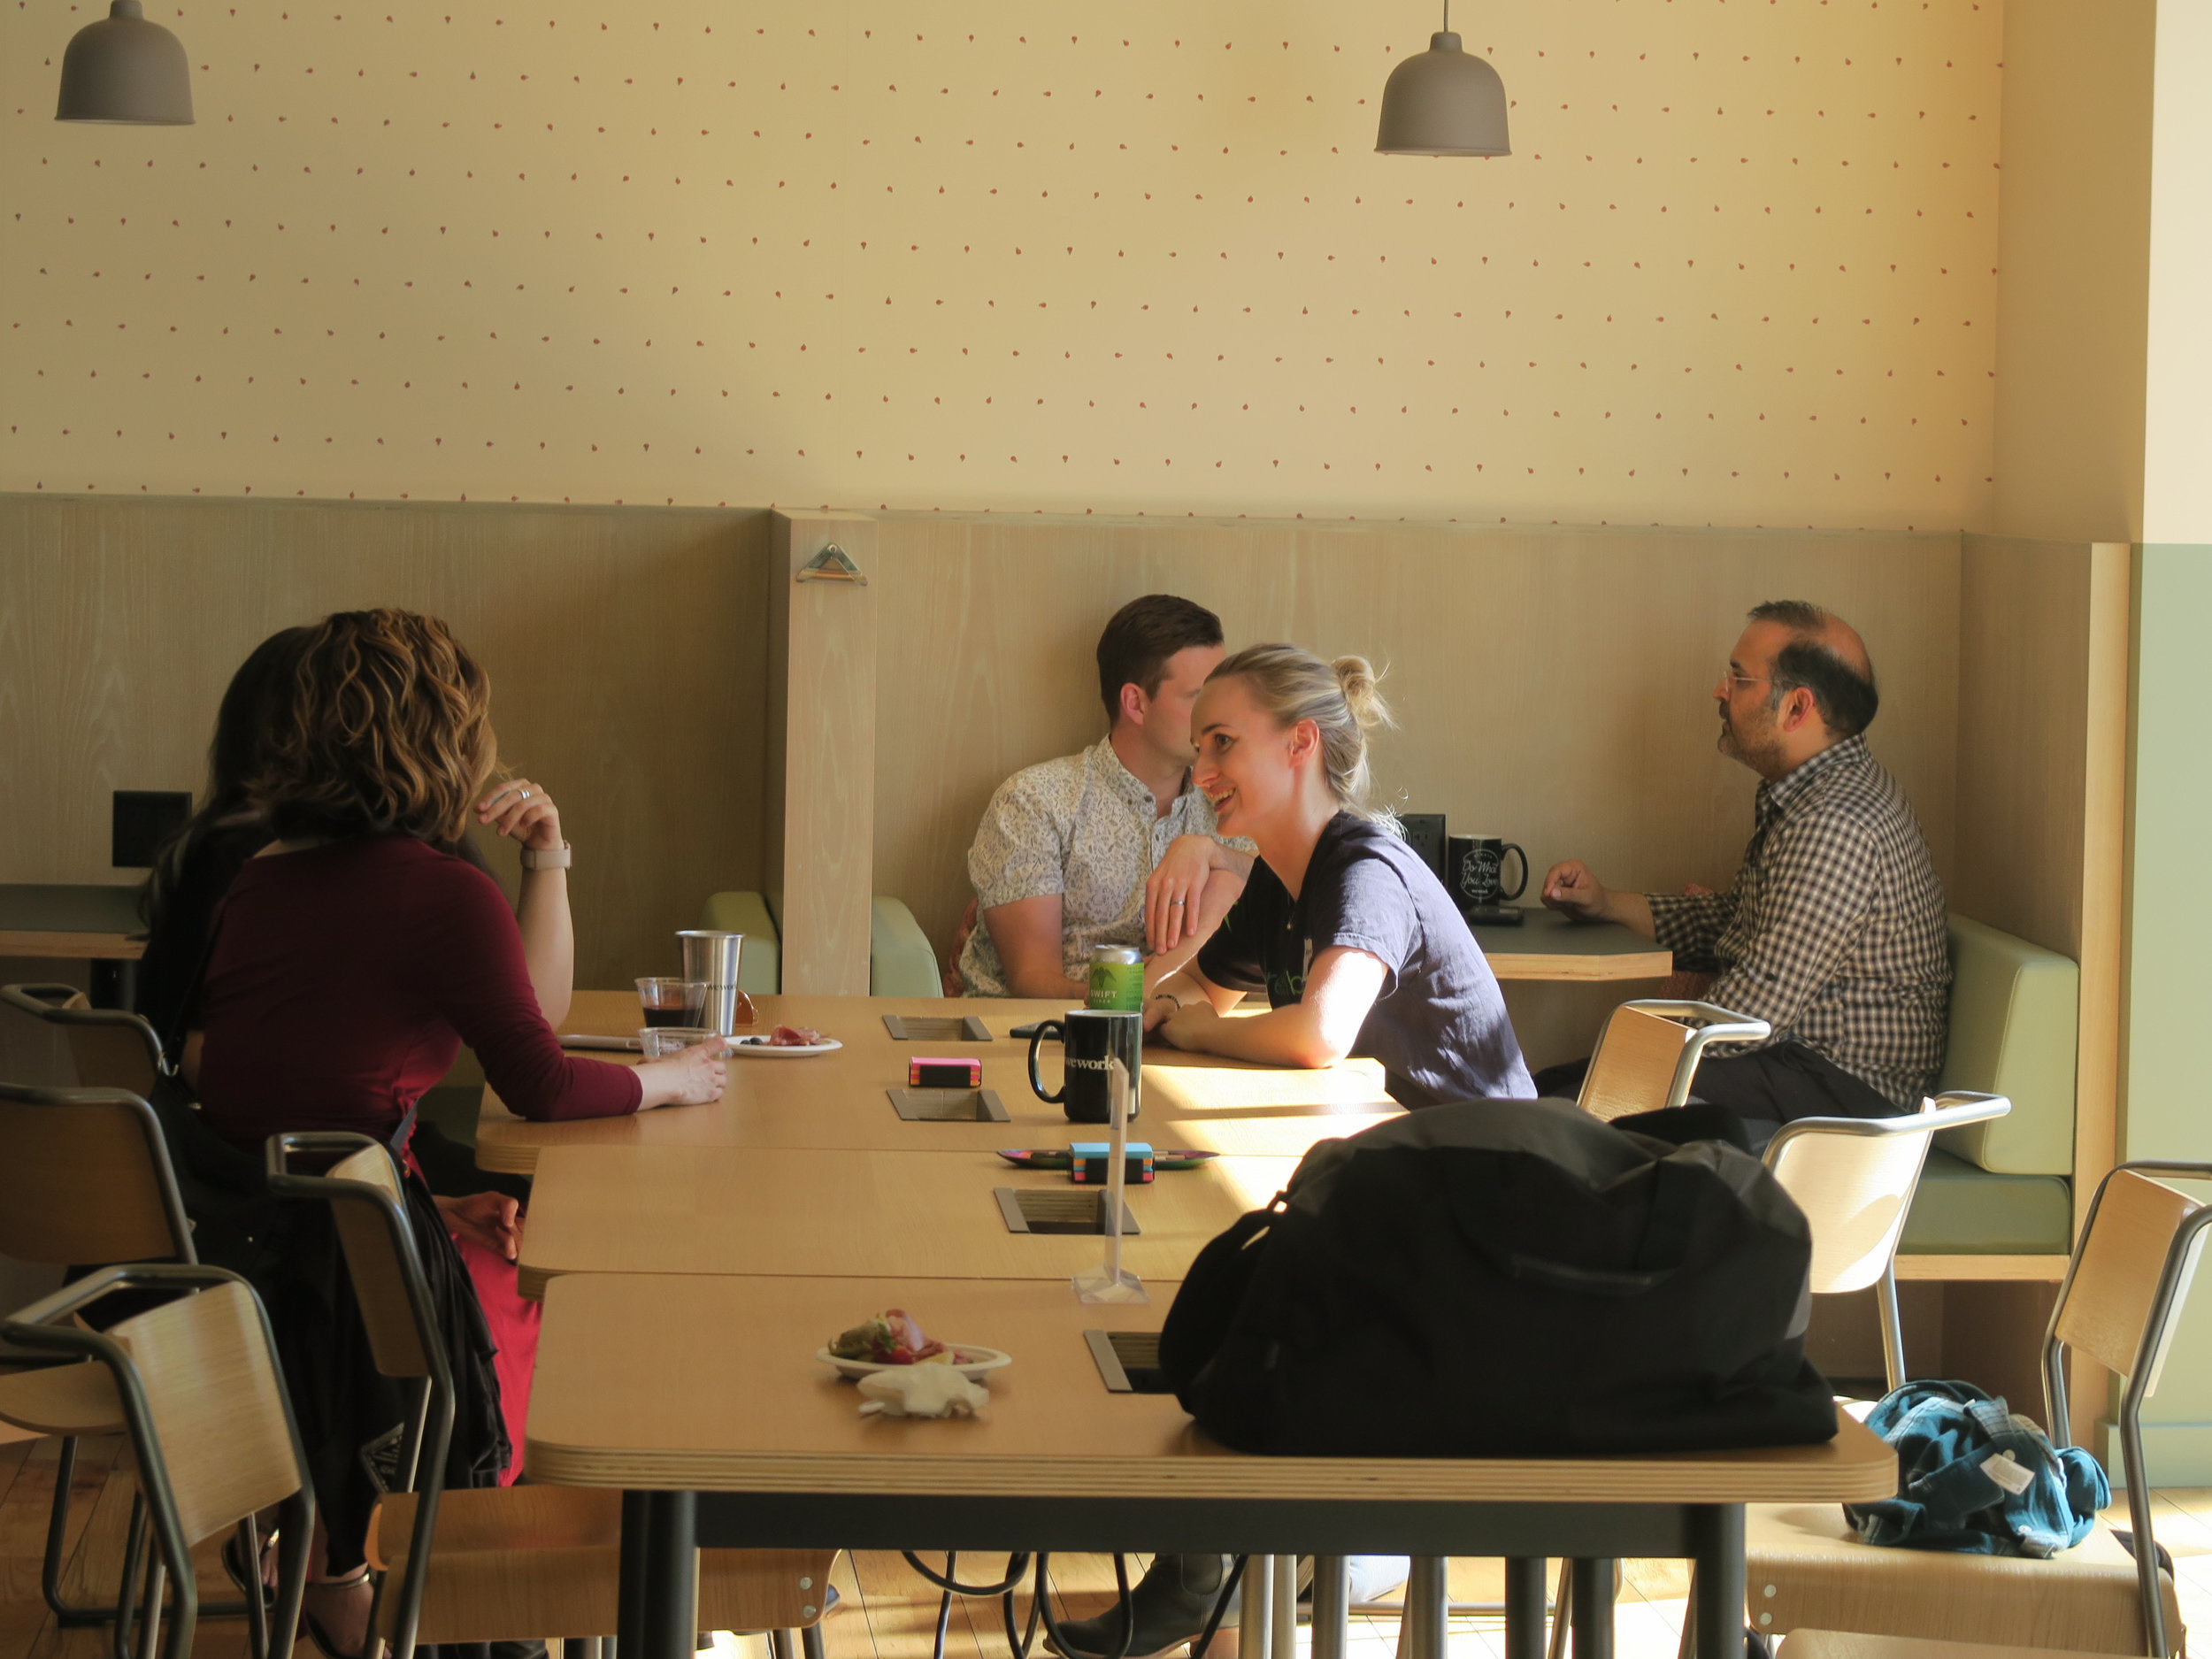 Folks talking at a table.jpg